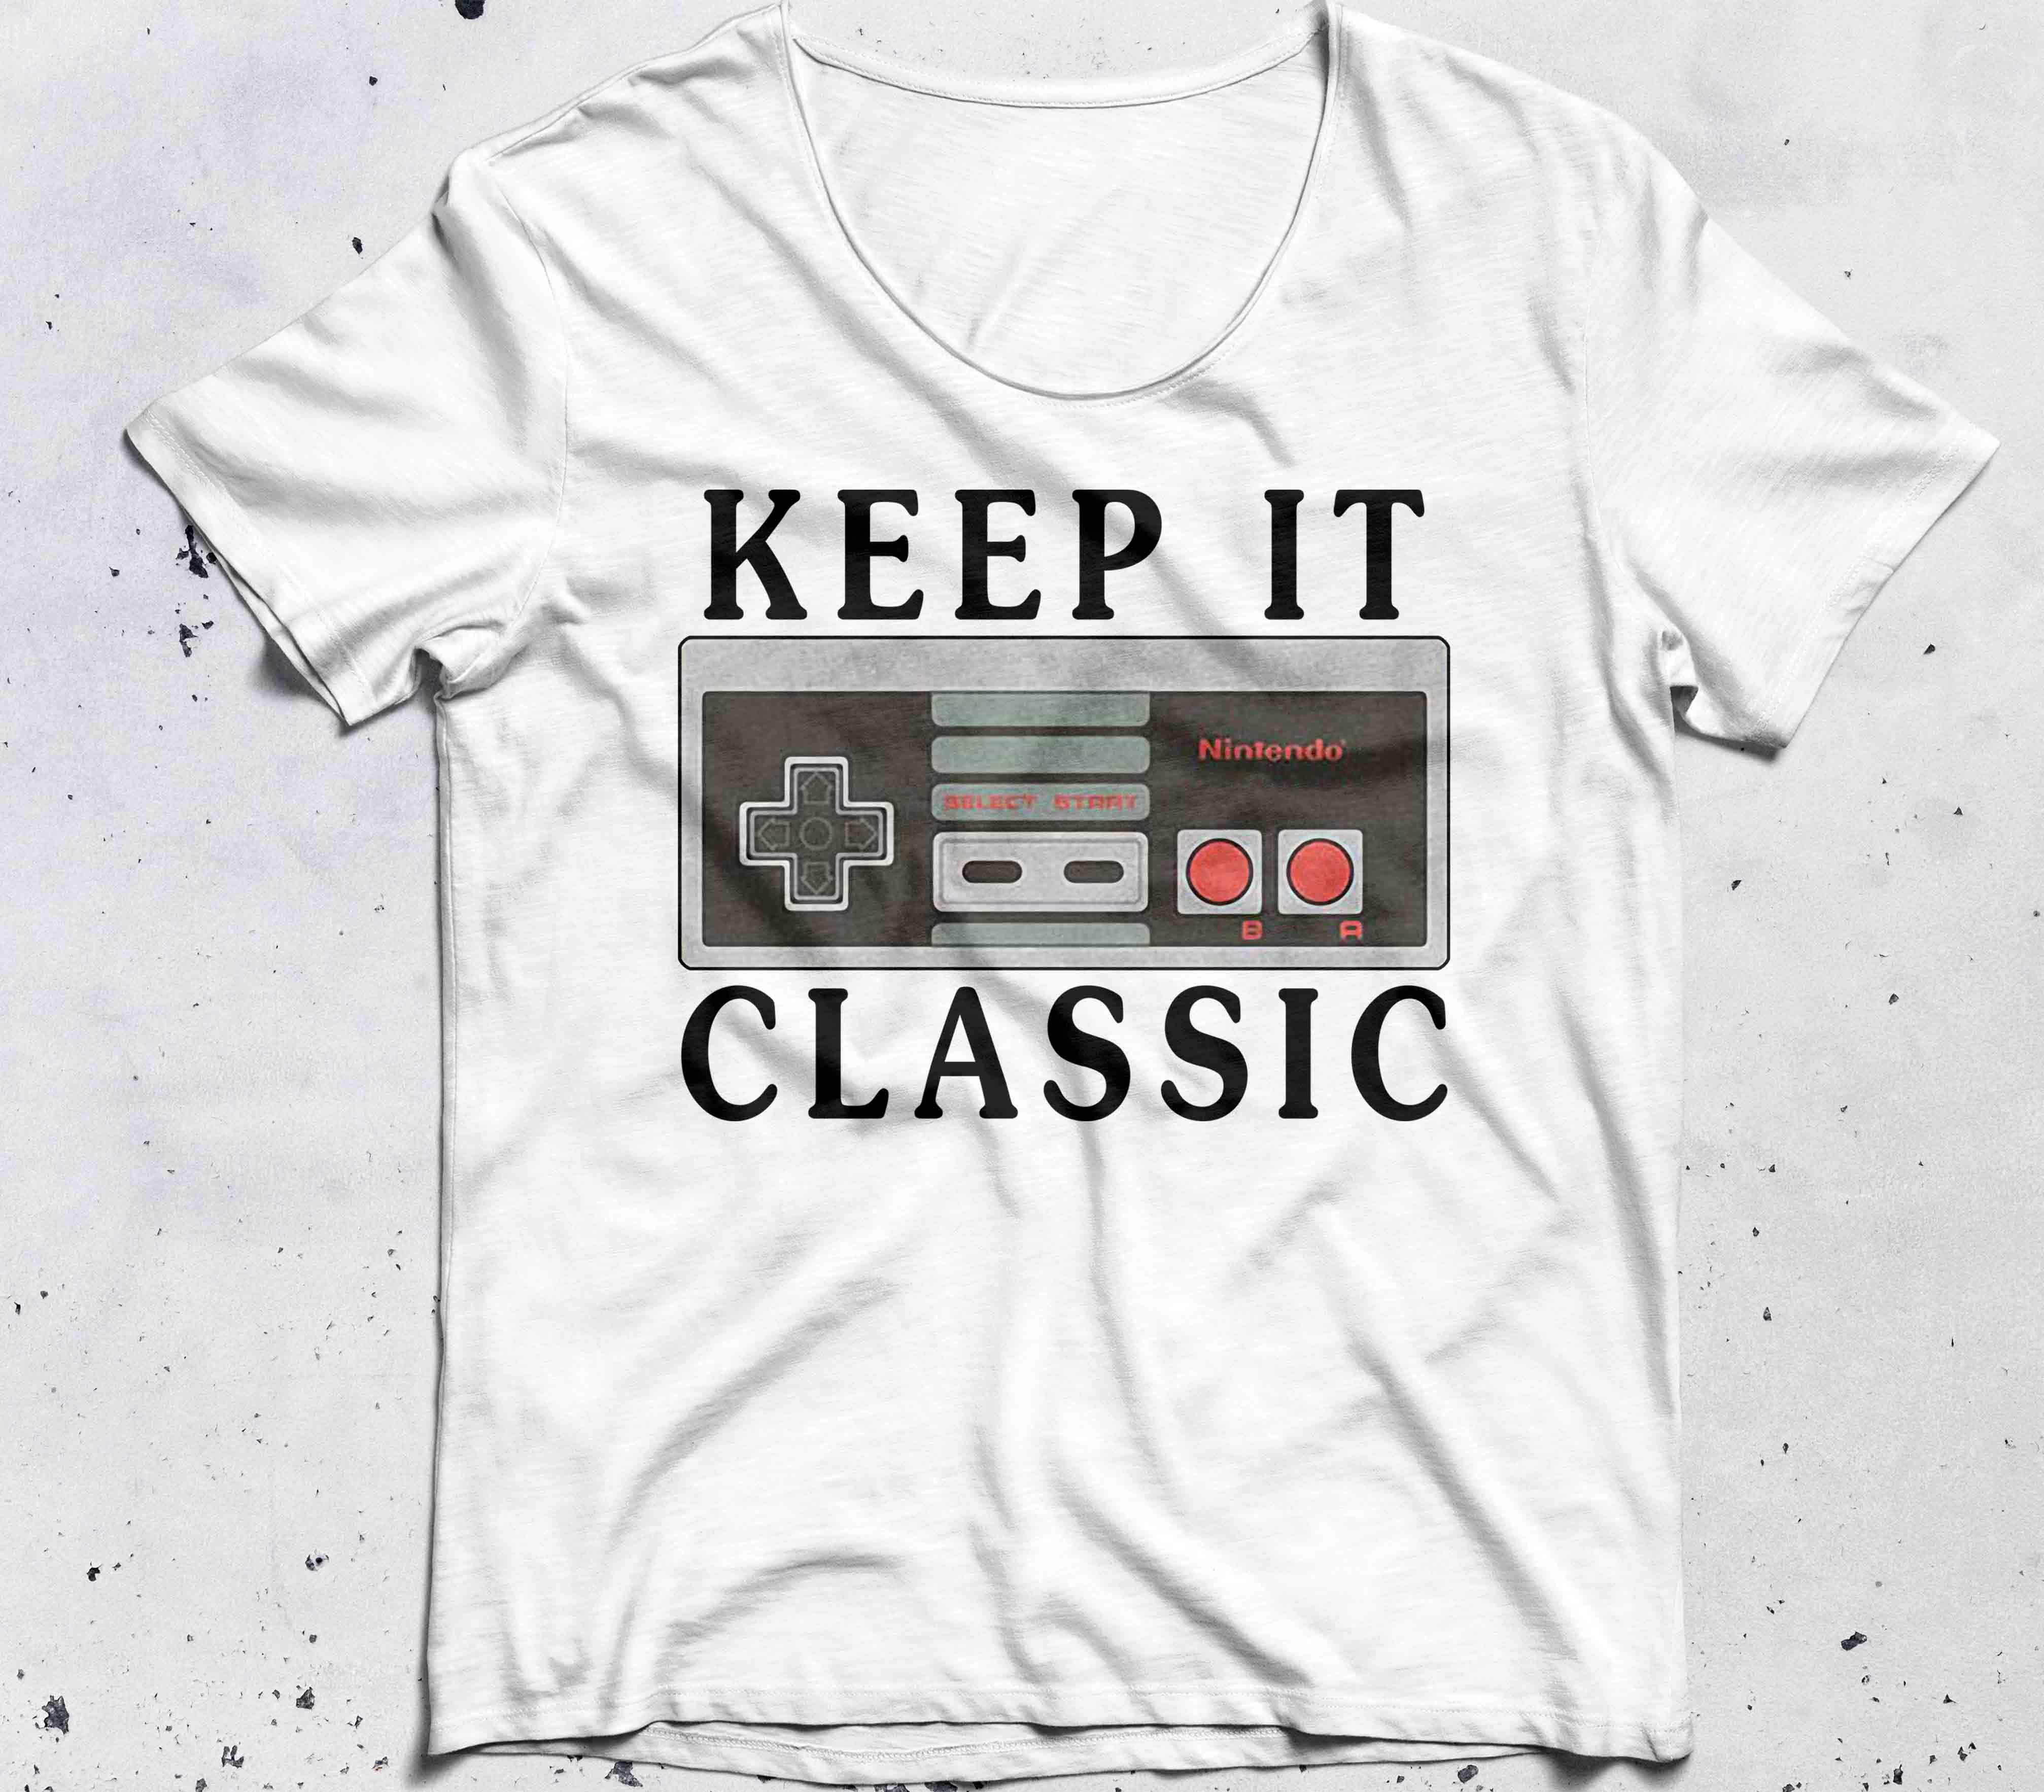 Retro Nintendo Controller Keep it Classic shirt